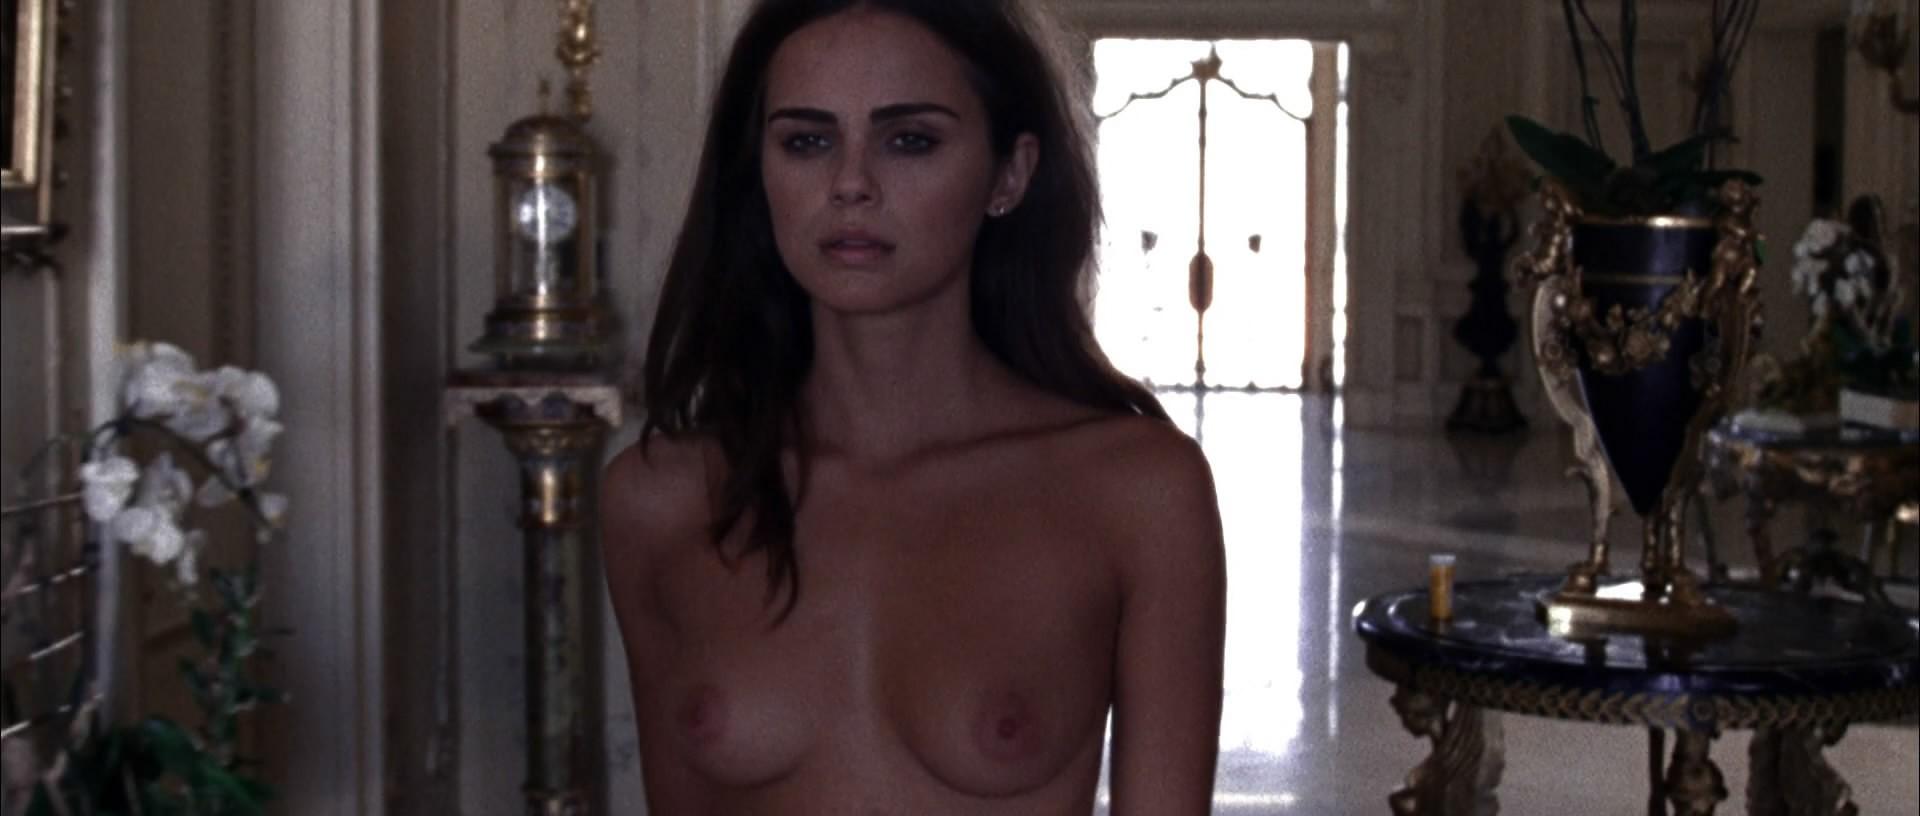 Alyson Eckmann Nude desnuda fotos de xenia deli desnuda tetas pezon culo nude